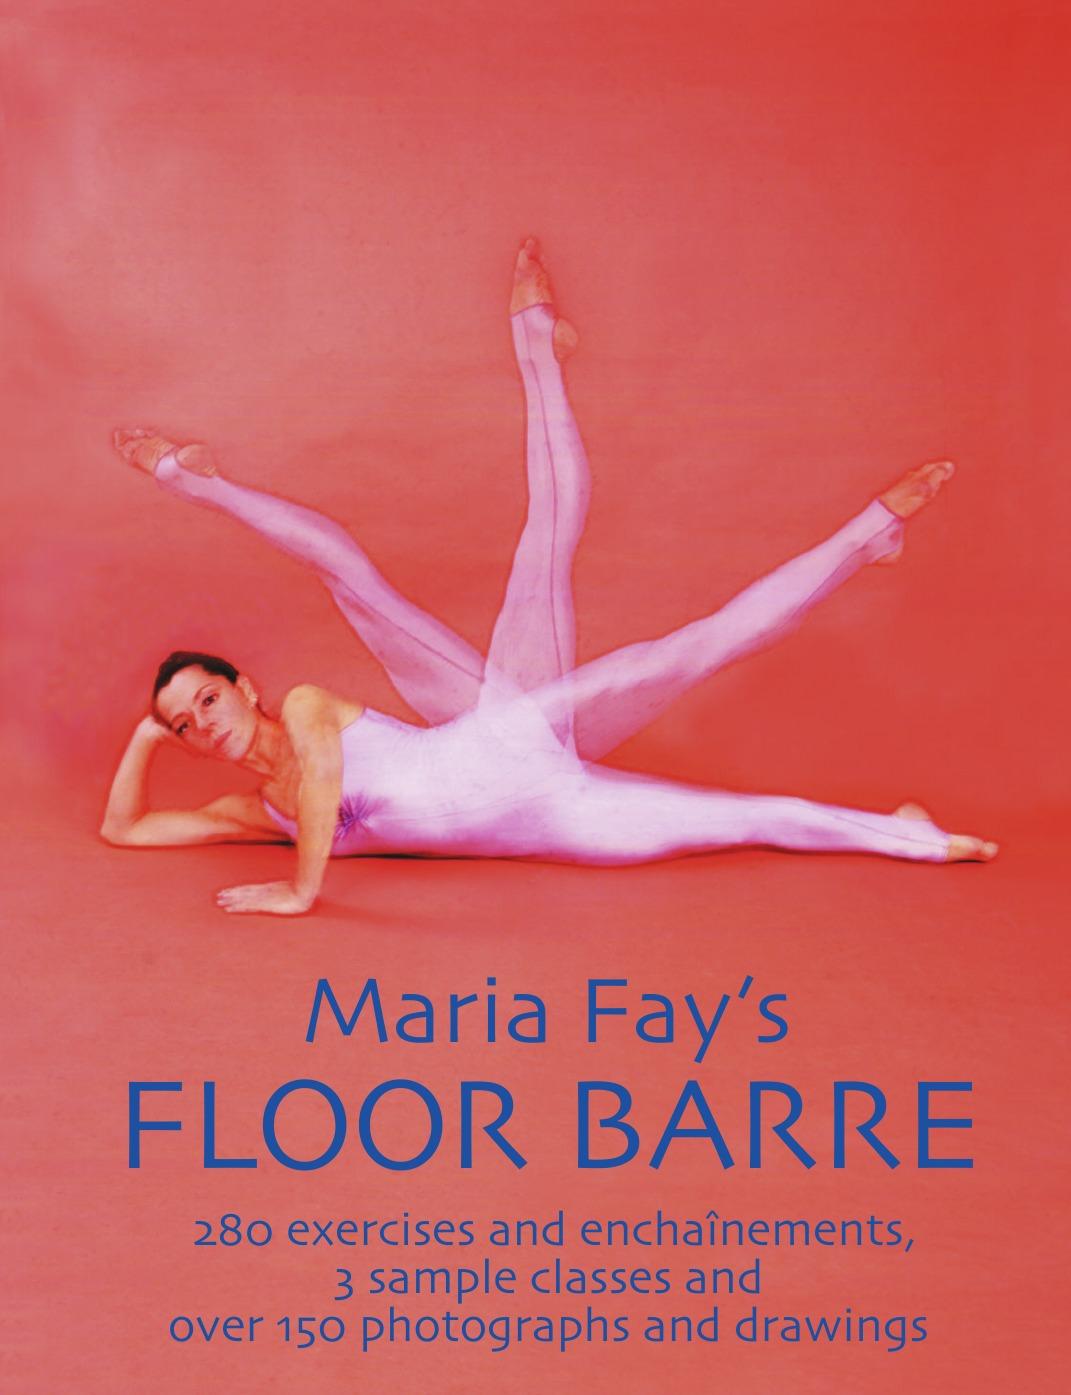 Maria Fay Maria Fay.s Floor Barre dress to the floor color beige